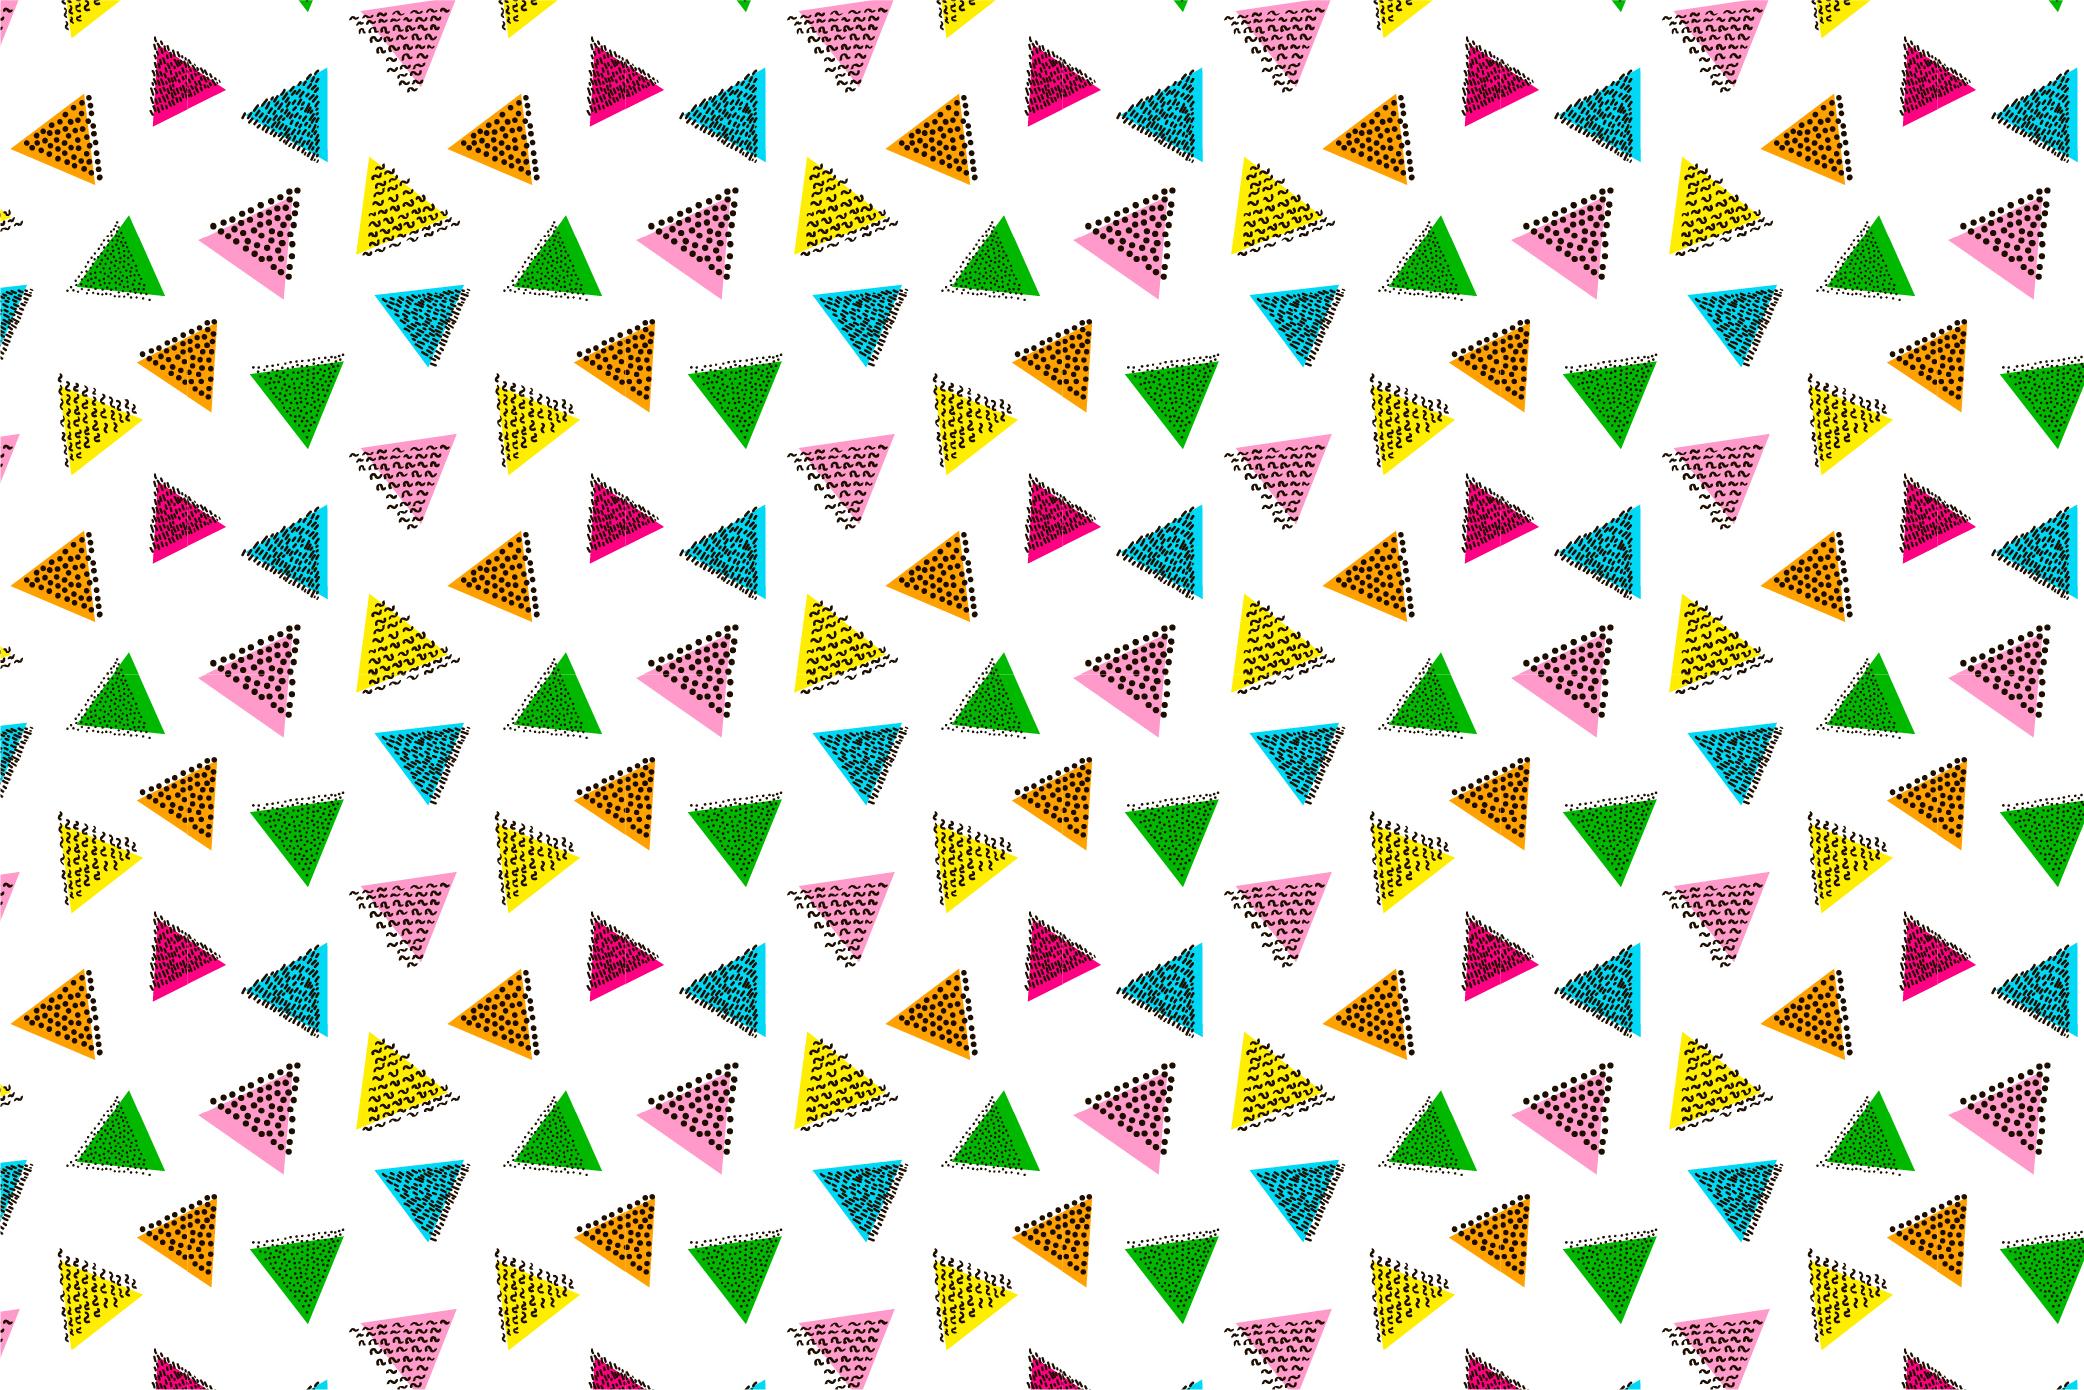 9 Geometric seamless patterns. Ai, EPS, JPG, SVG example image 3